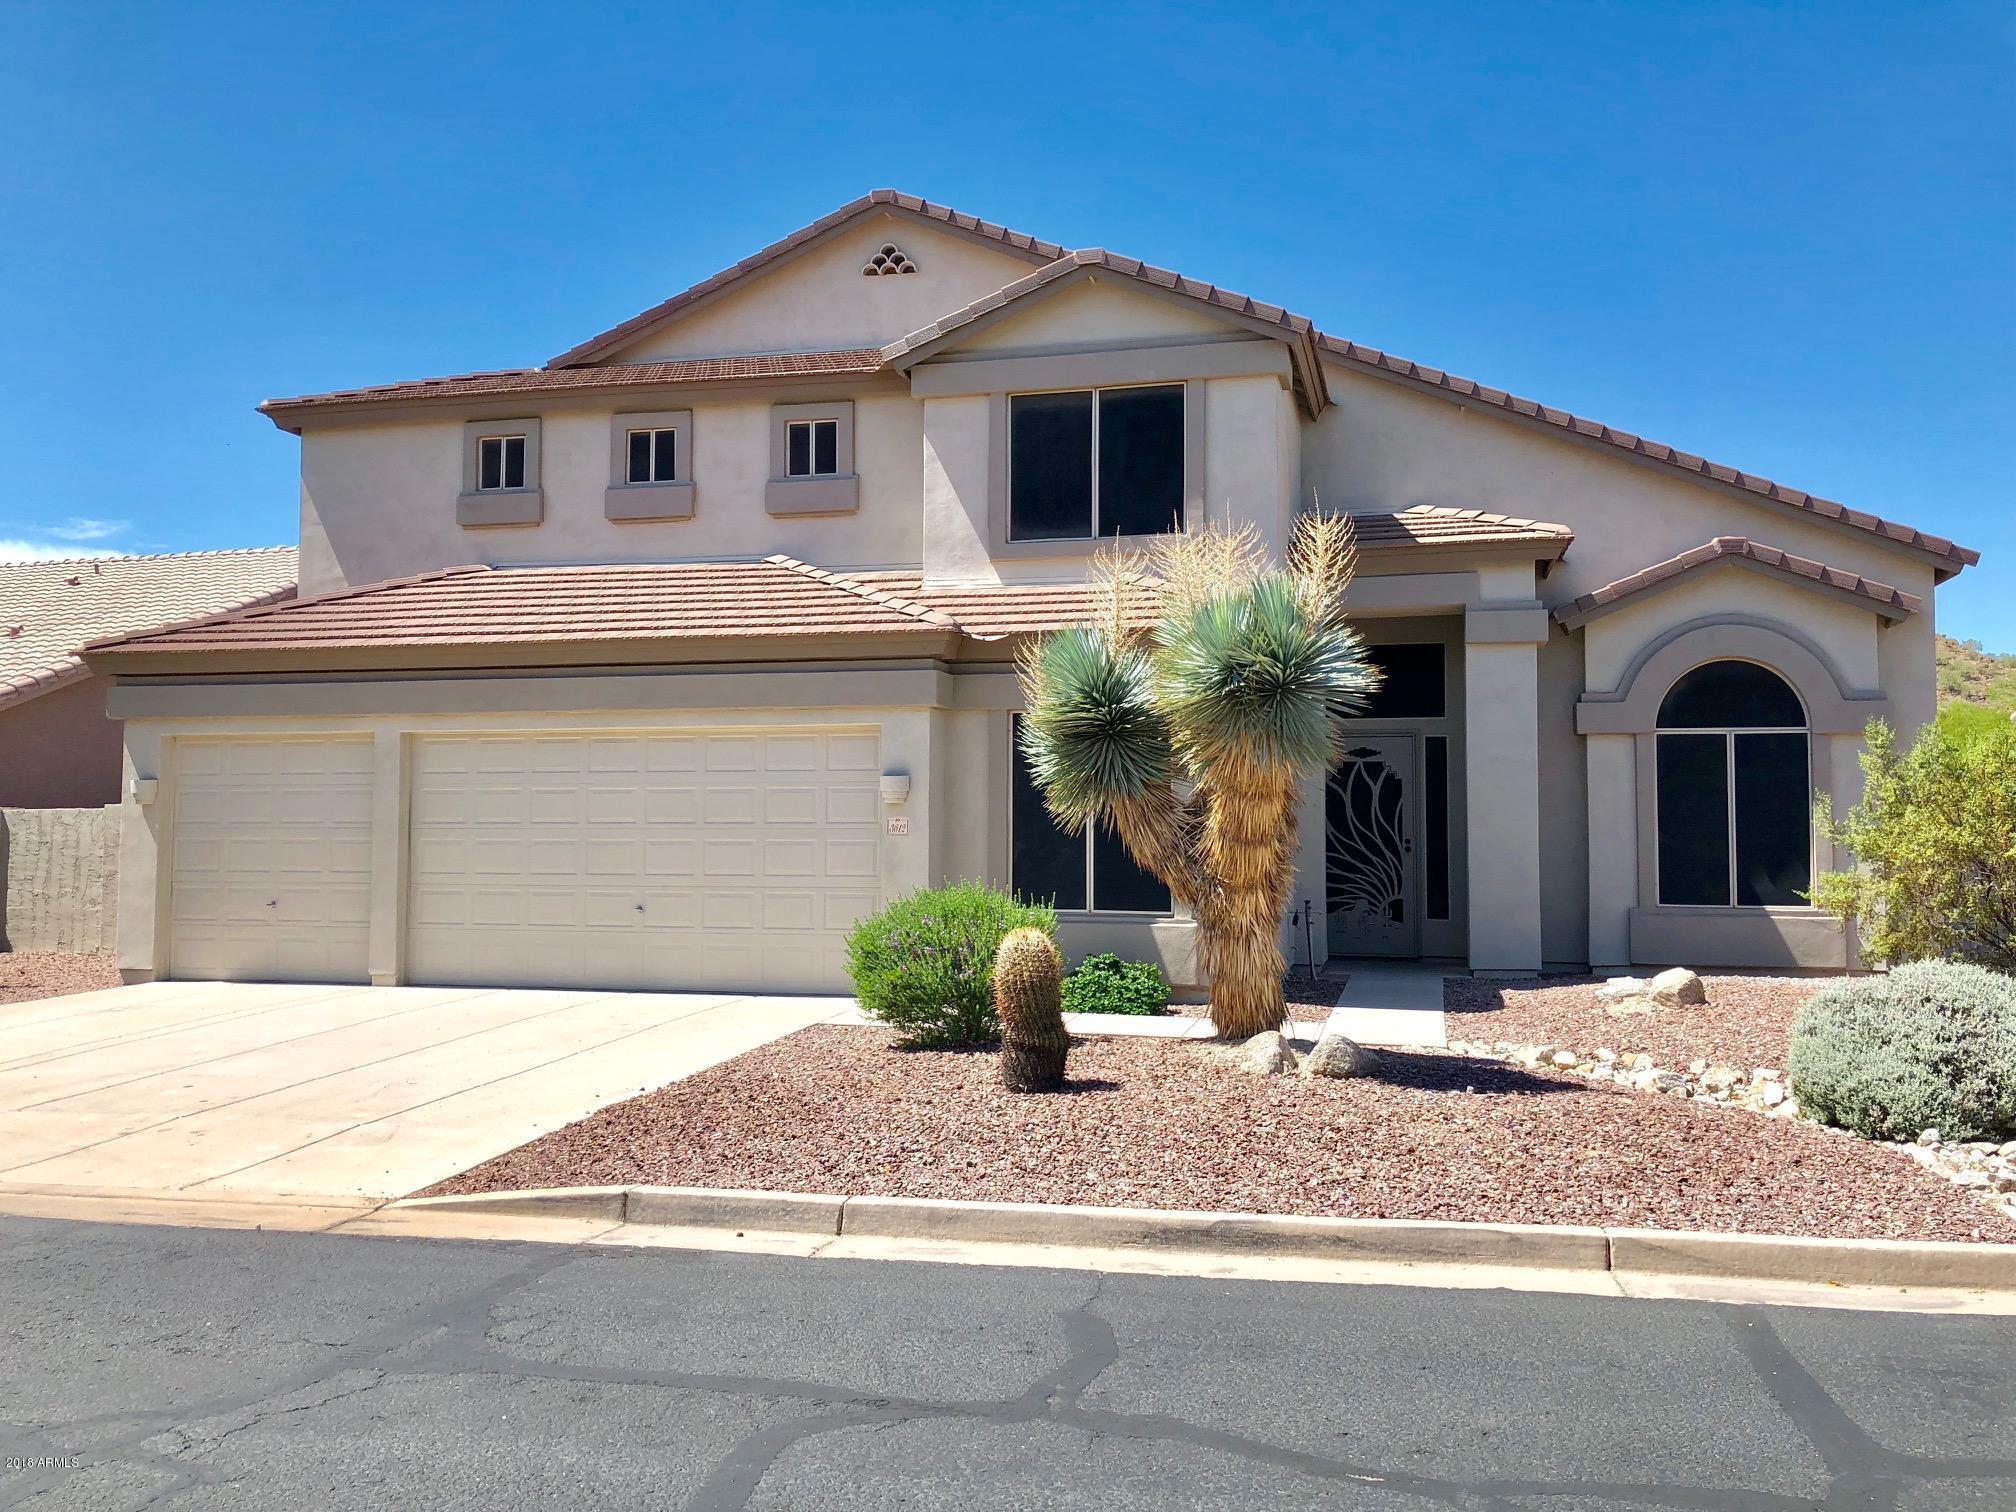 Photo of 3612 N SONORAN HEIGHTS Heights, Mesa, AZ 85207